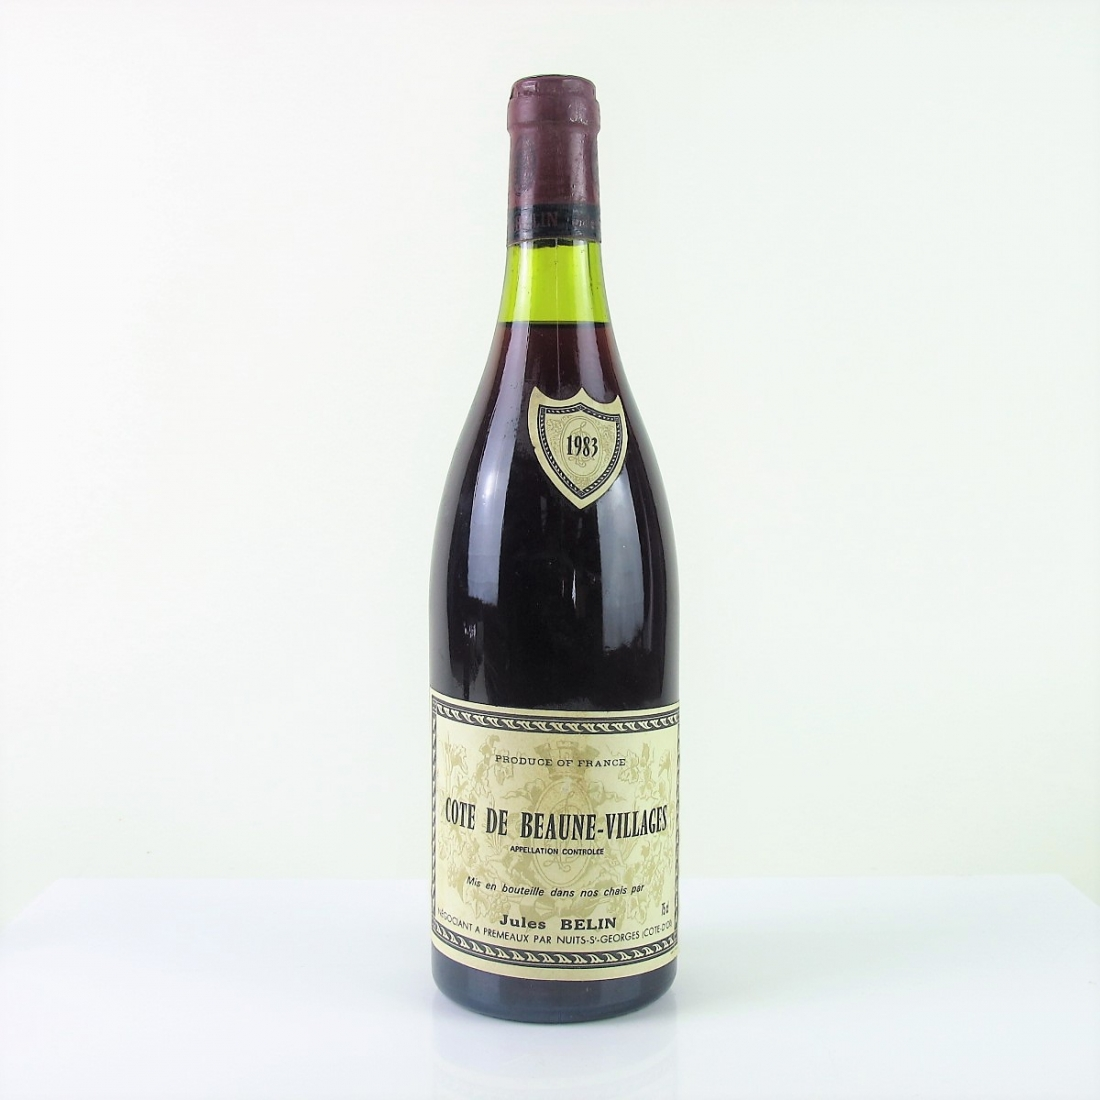 J.Belin 1983 Côte-de-Beaune